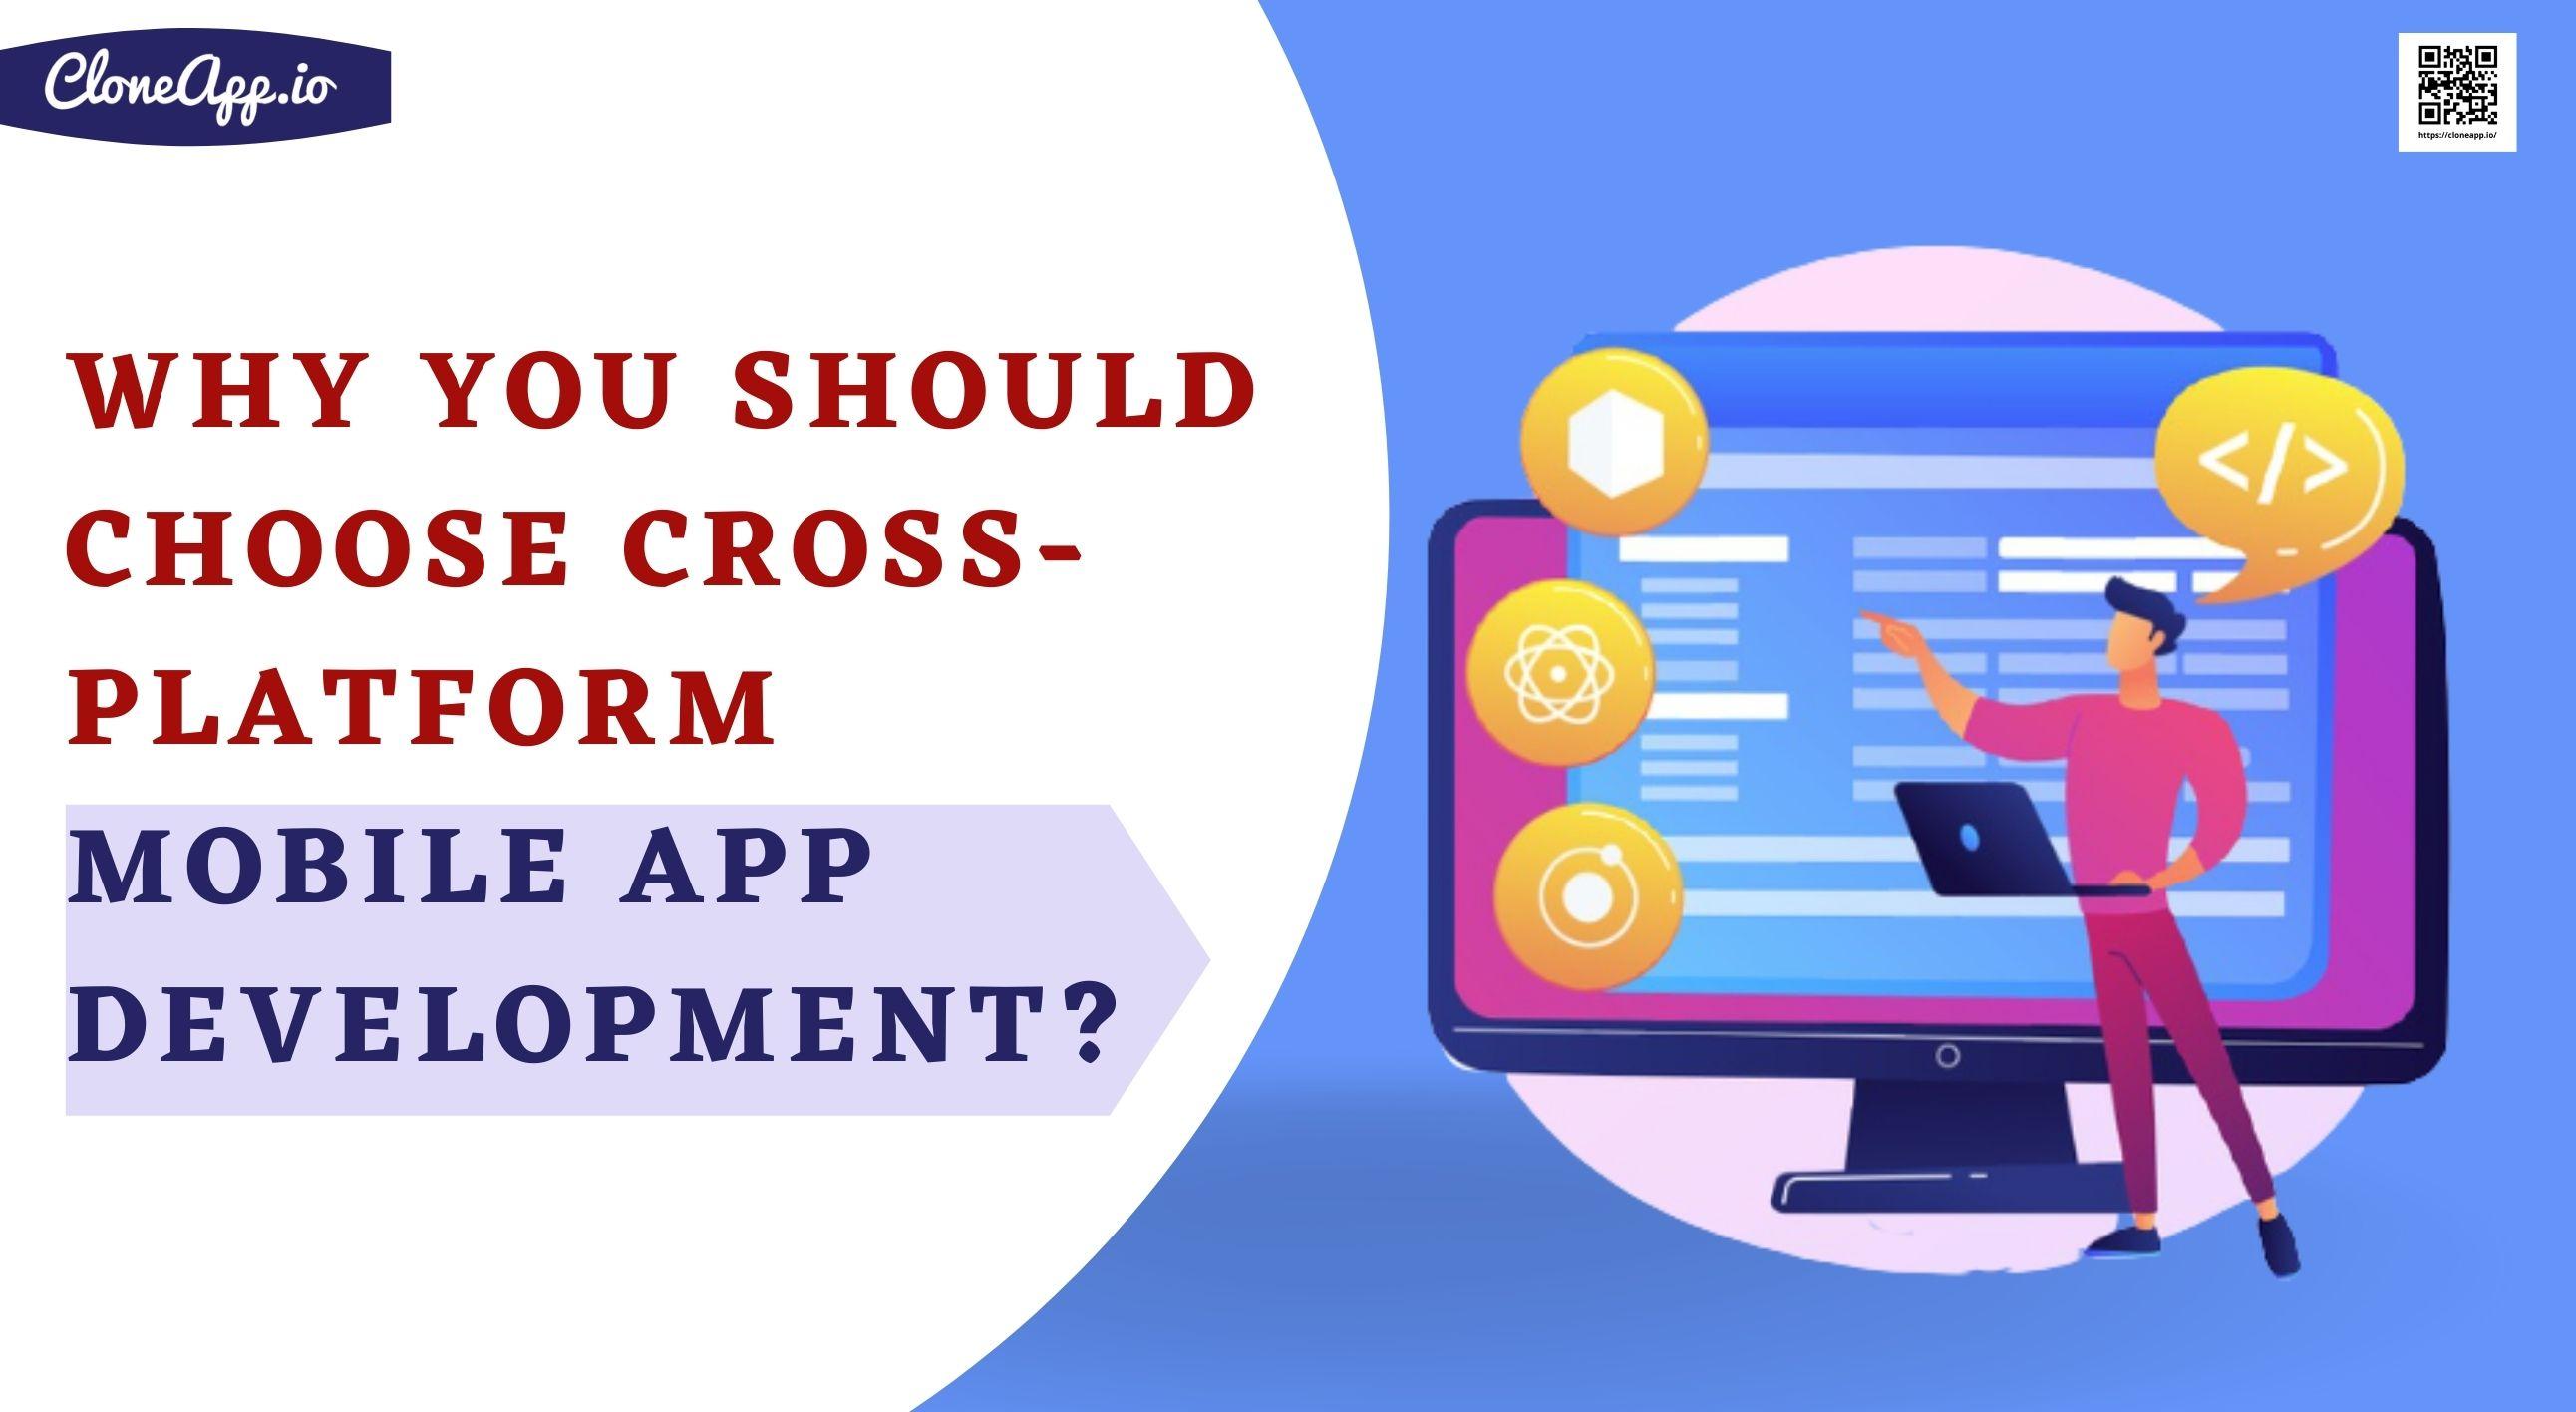 Why you should choose cross-platform mobile app development